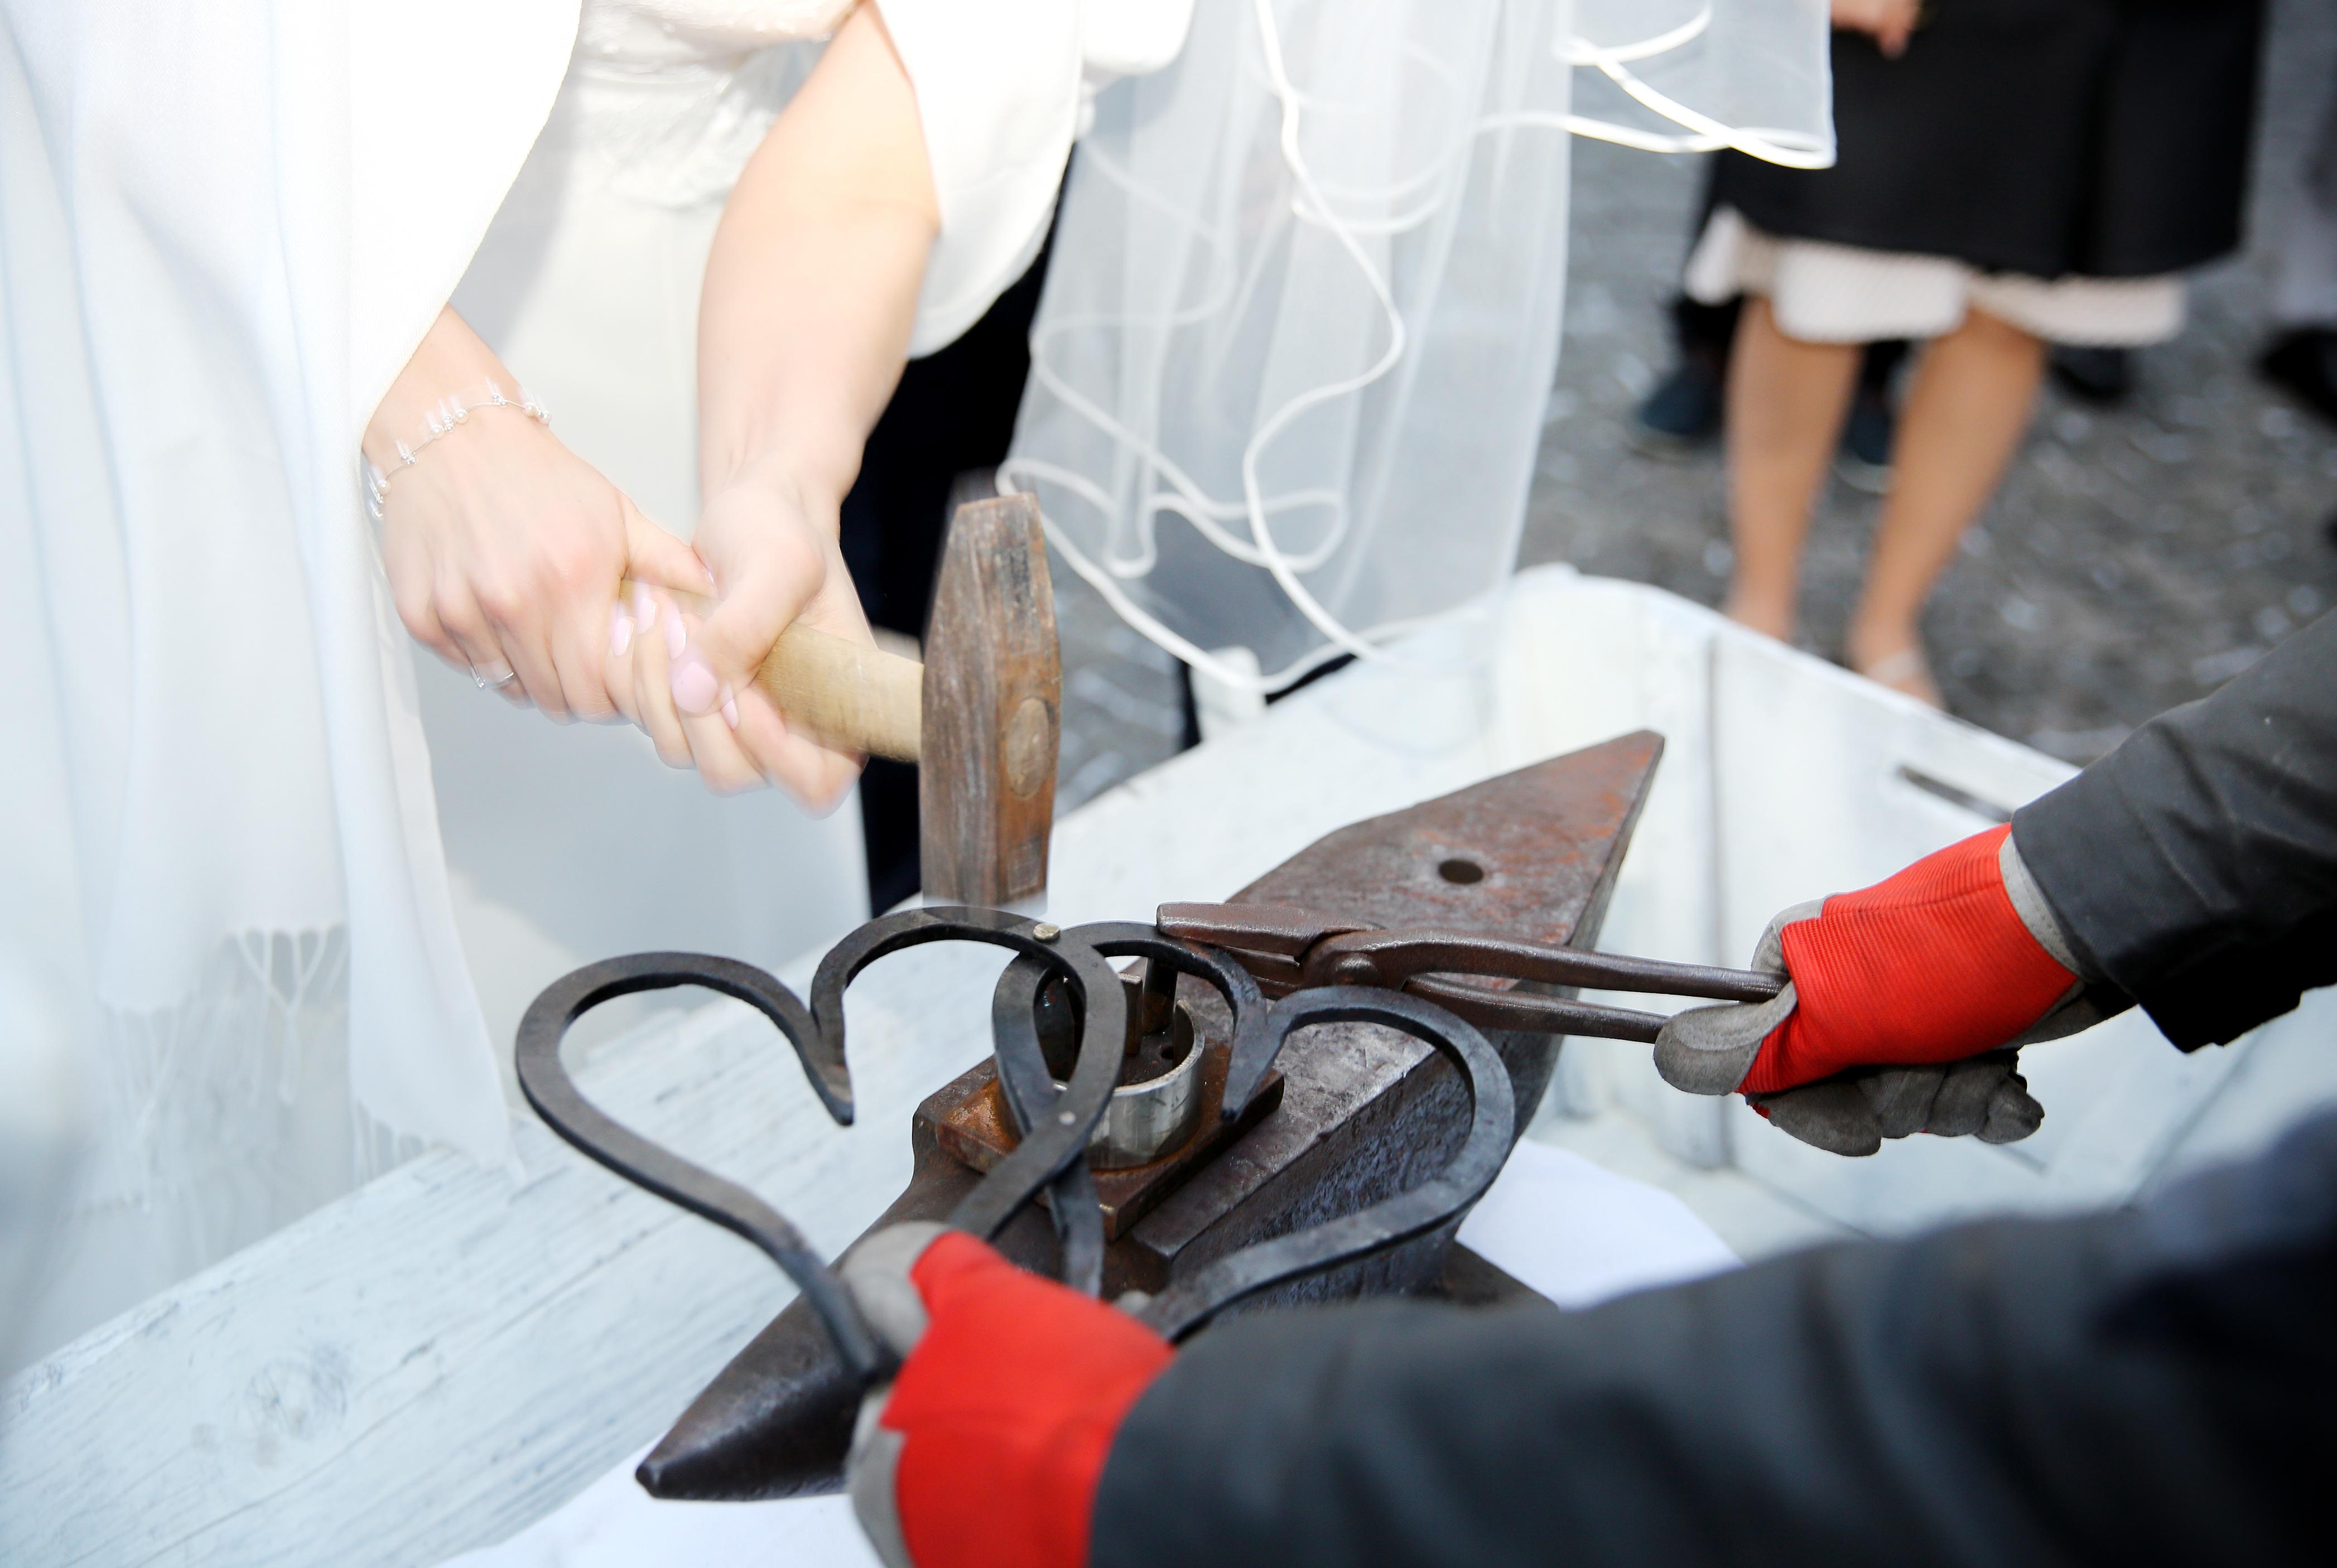 Krellsche Schmiede - Hochzeitsschmieden